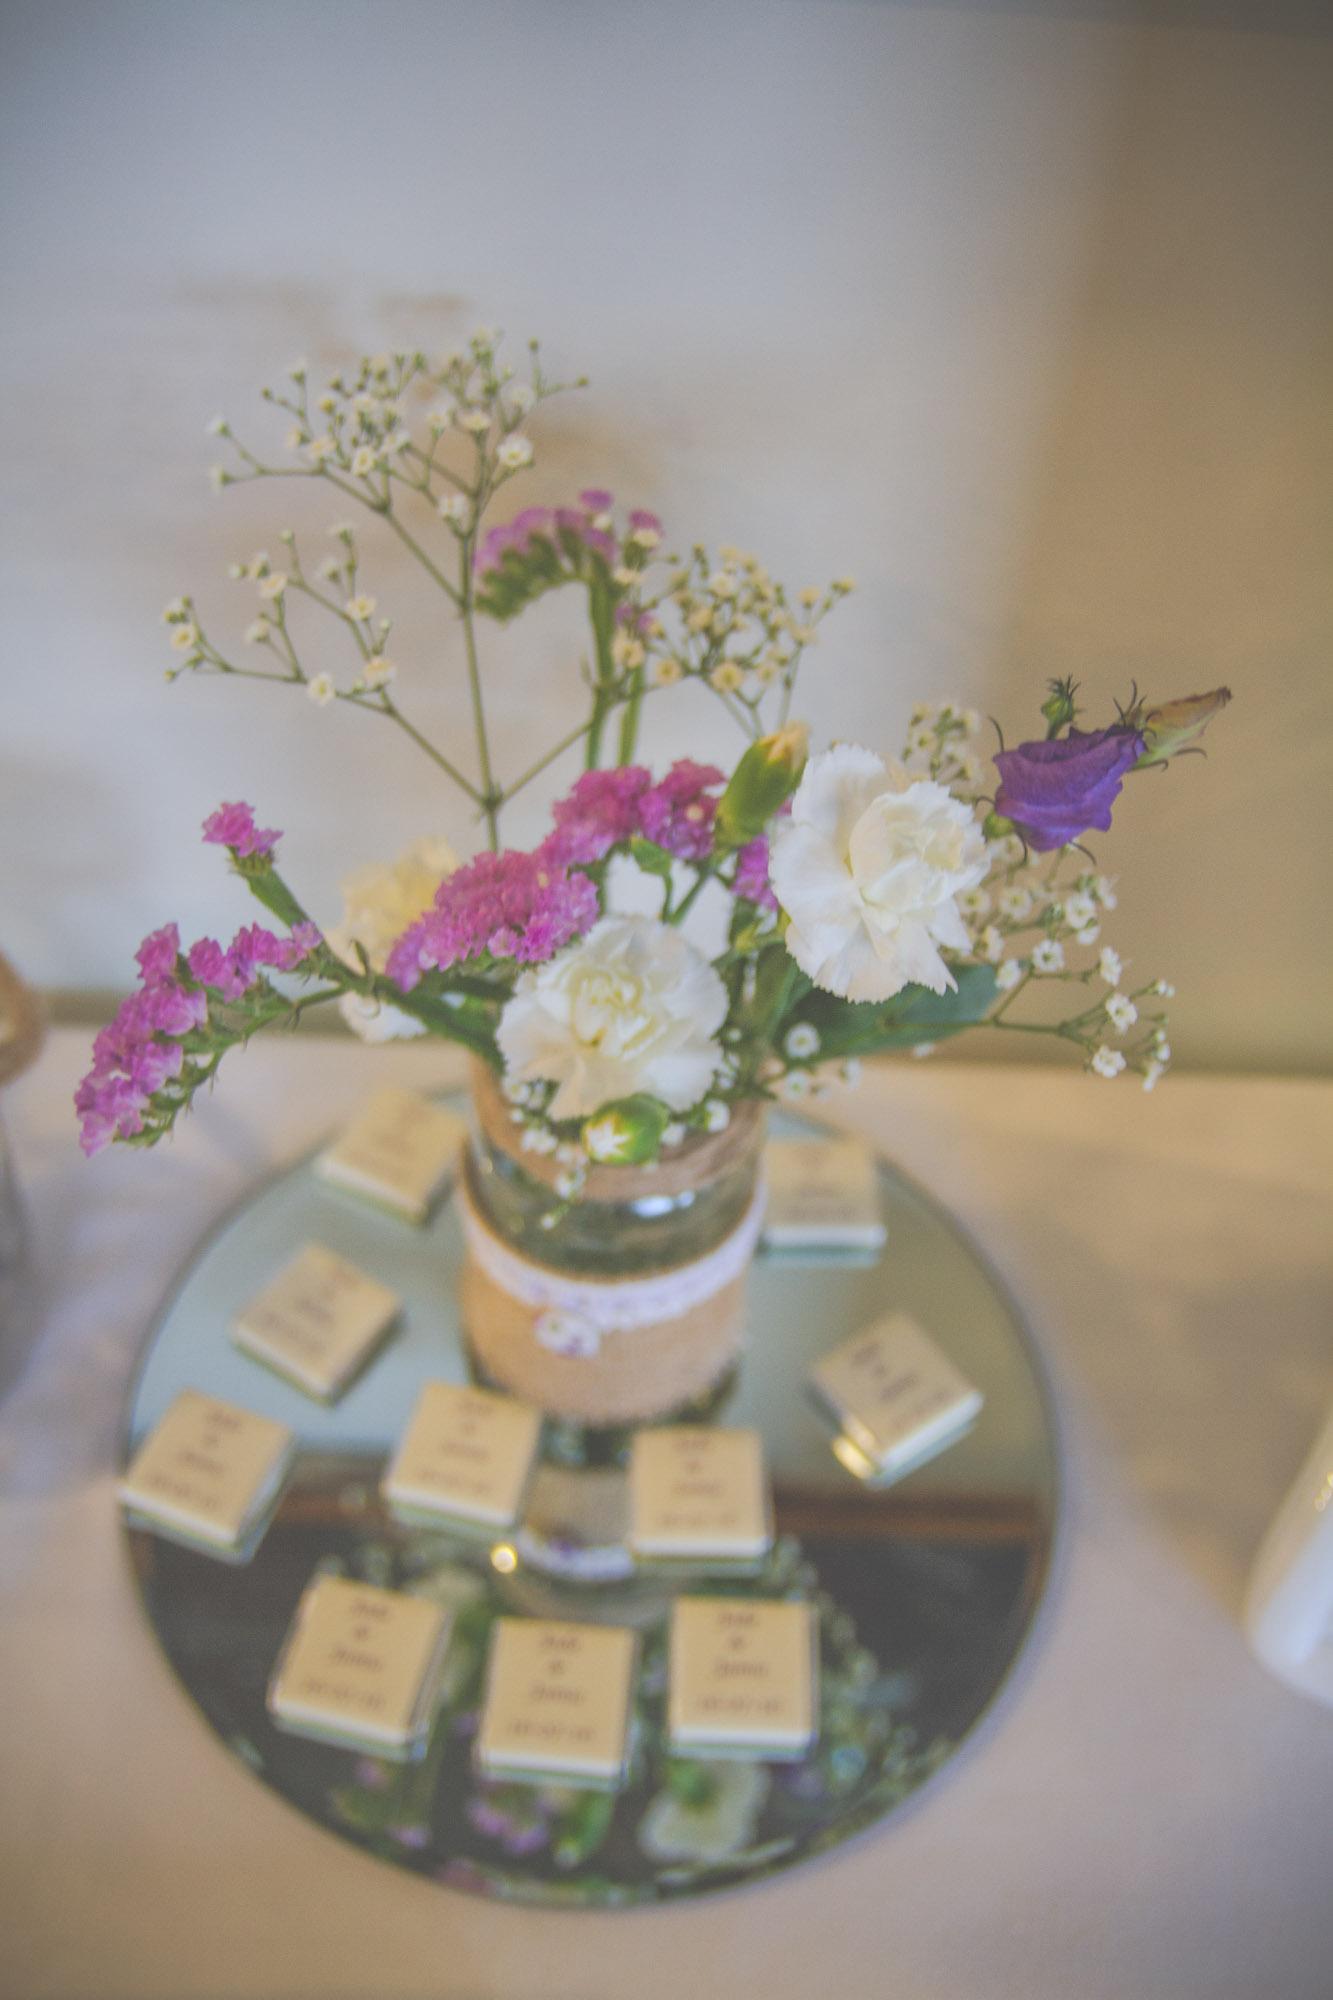 skipton-registry-office-wedding-photography-54.jpg